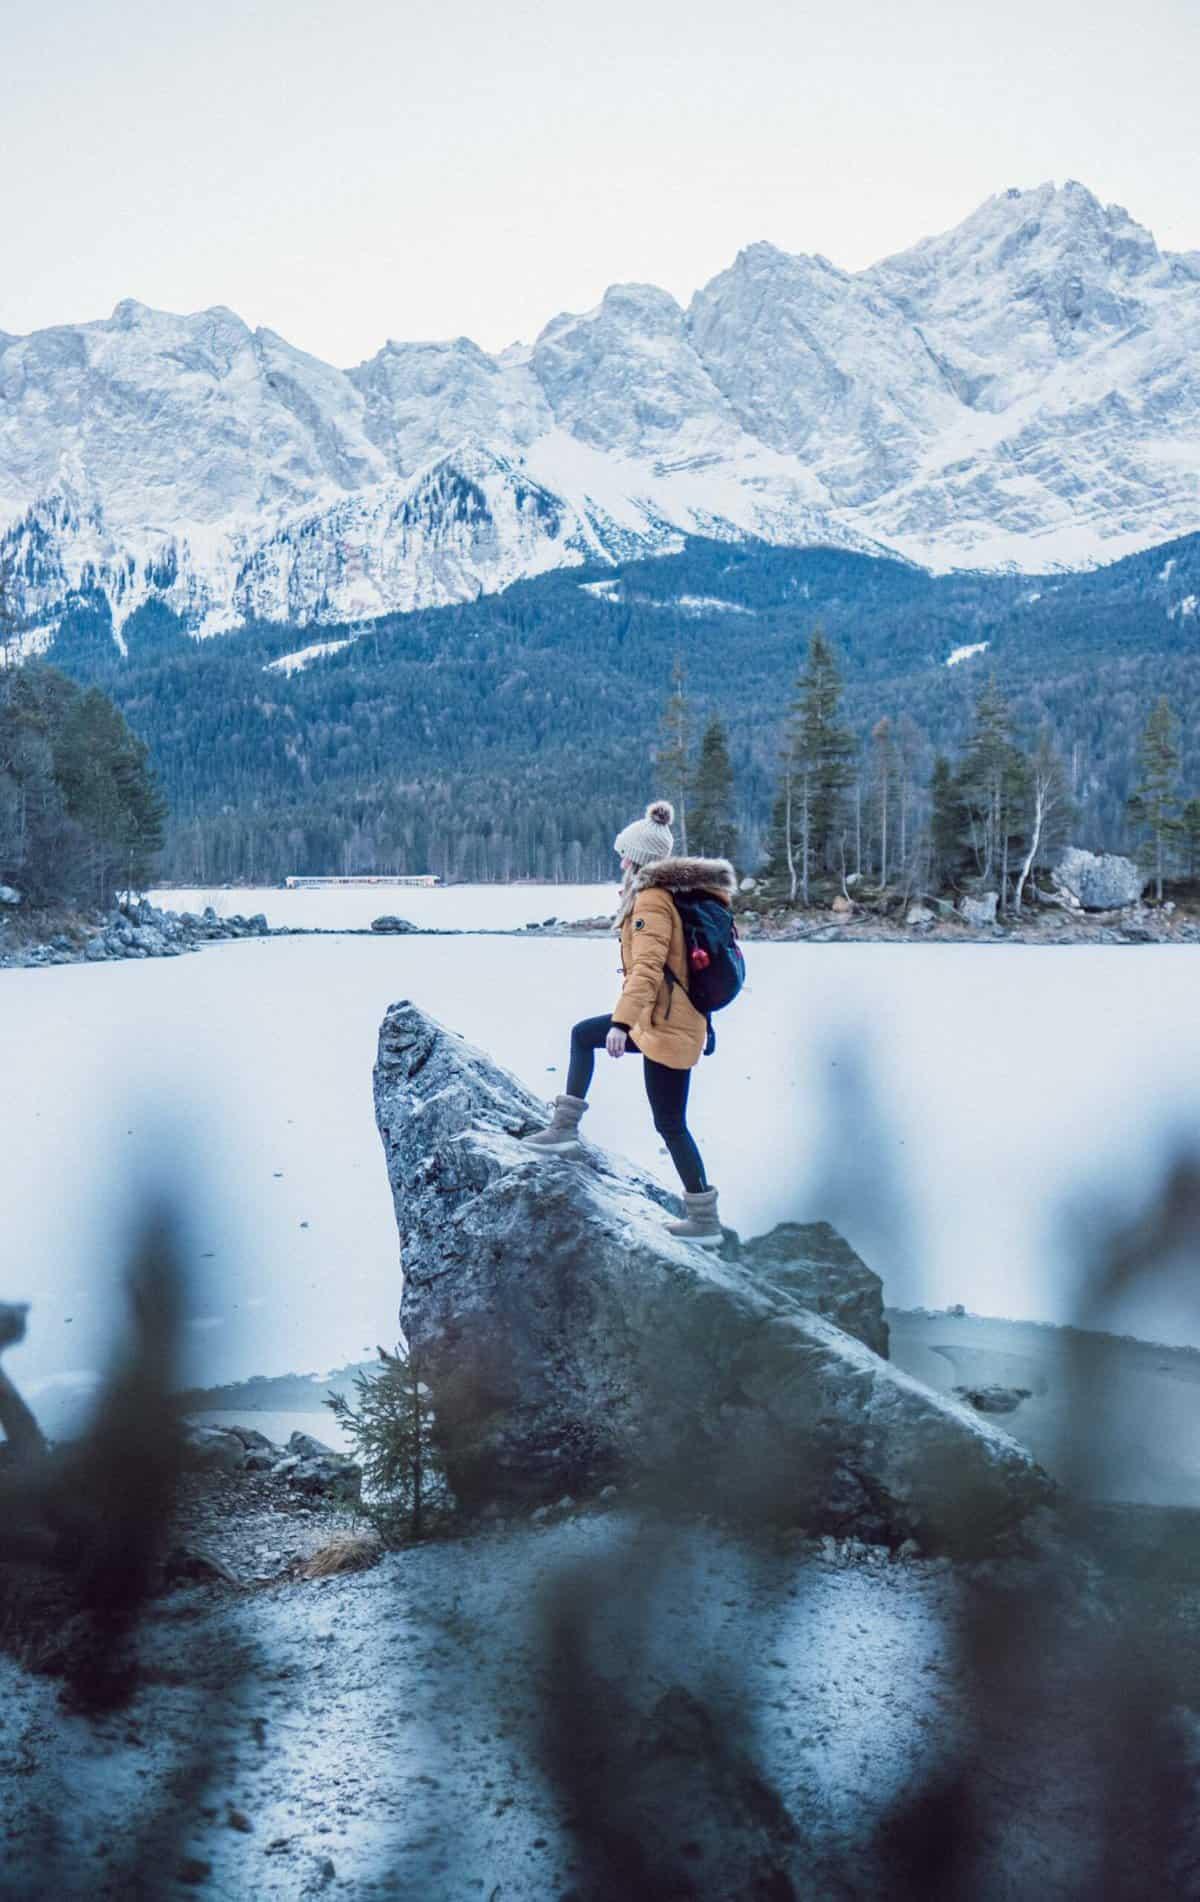 Best hikes in Bavaria